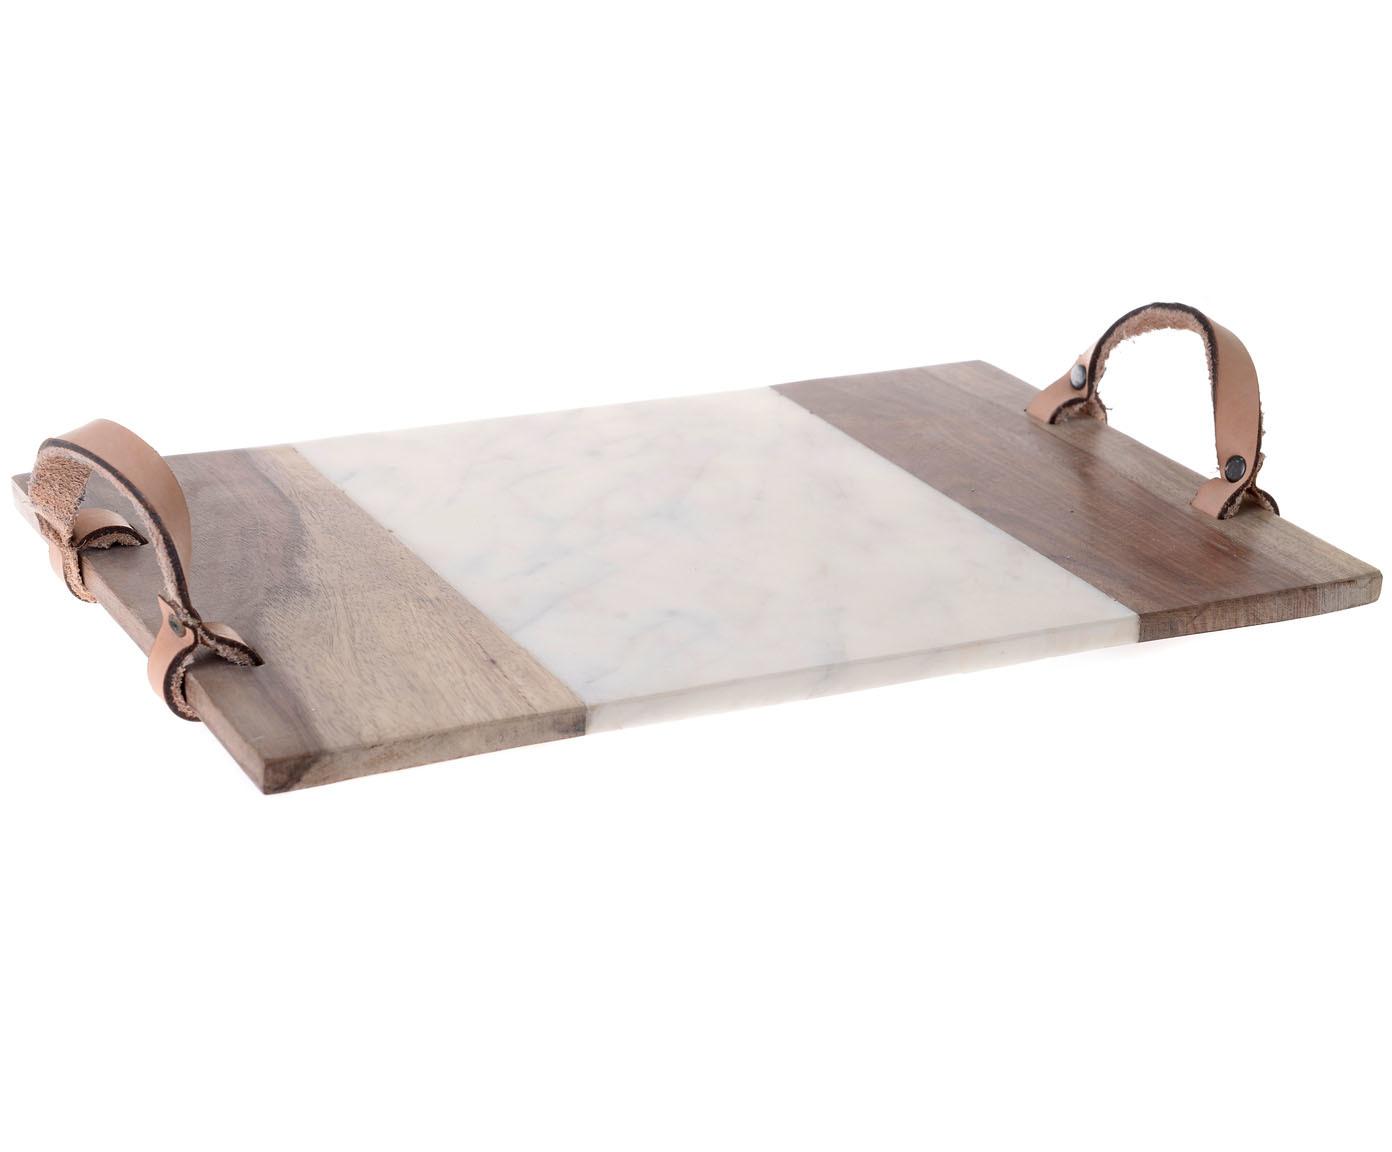 Поднос-разделочная доска KlinteaПодставки и доски<br><br><br>Material: Мрамор<br>Ширина см: 35.0<br>Высота см: 1.0<br>Глубина см: 23.0